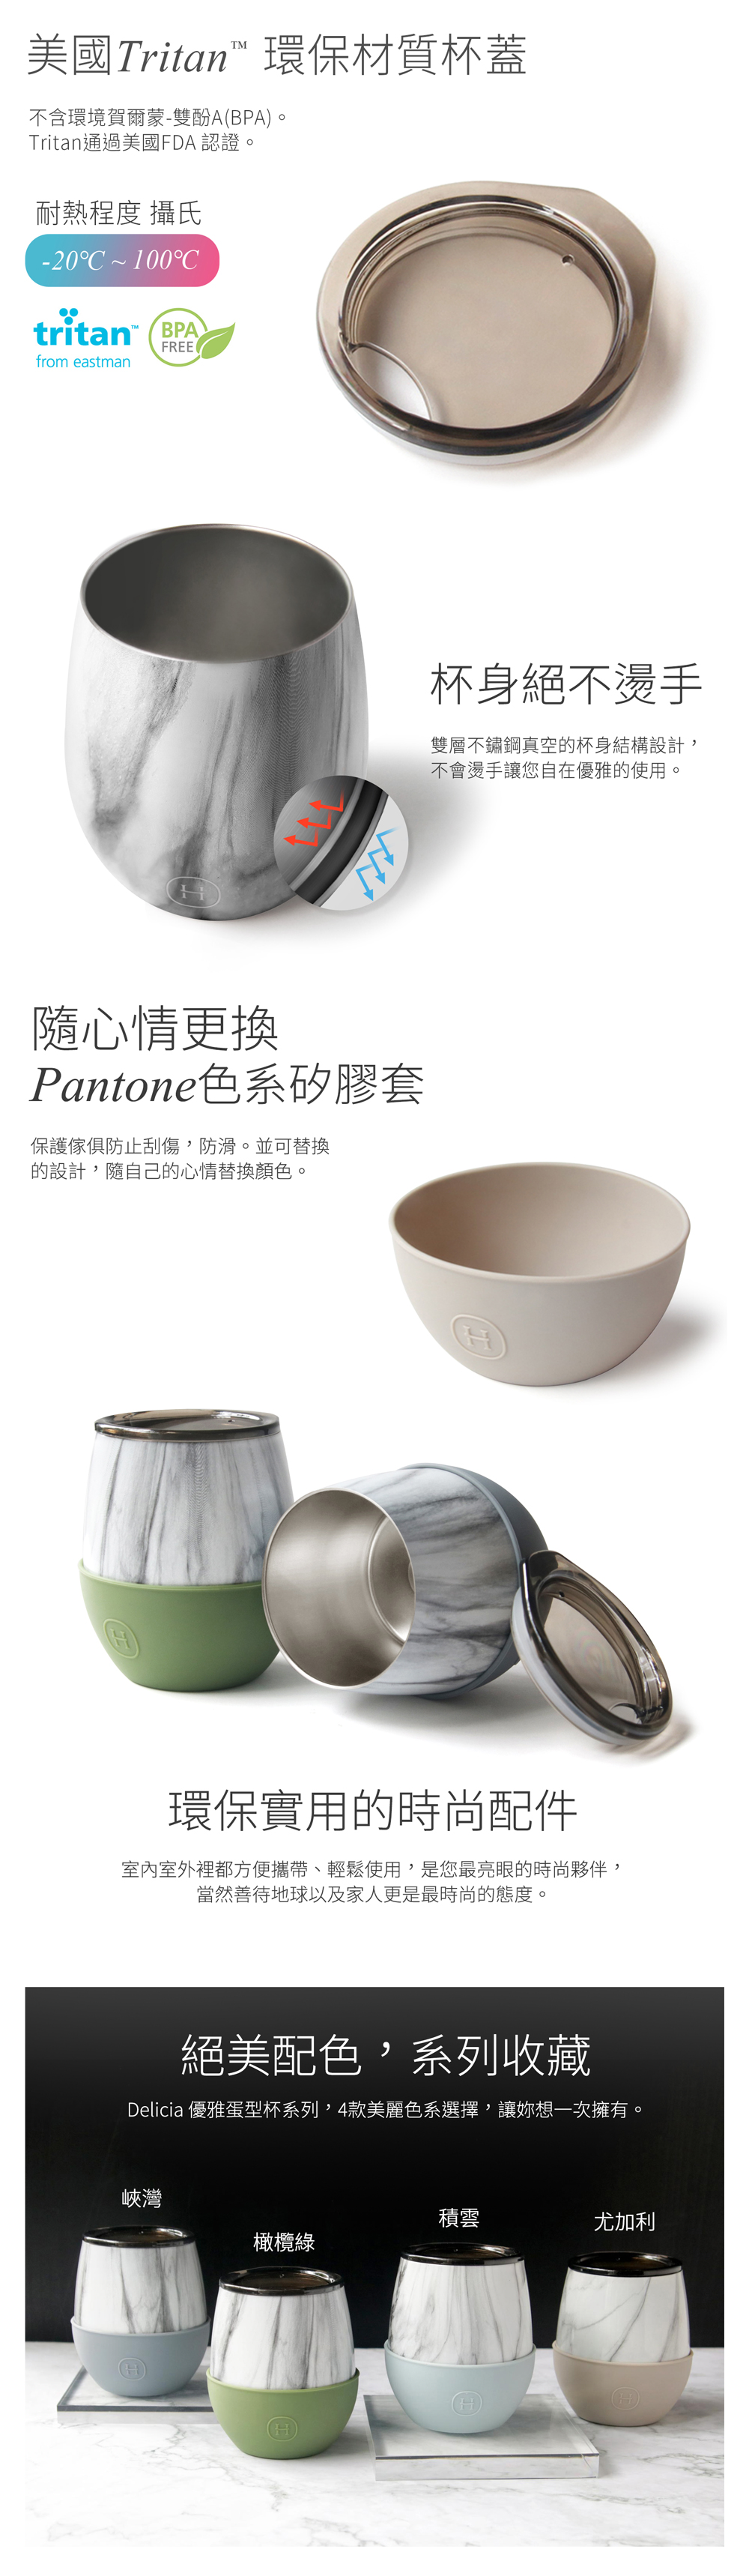 美國 HYDY Delicia 大理石紋蛋型杯